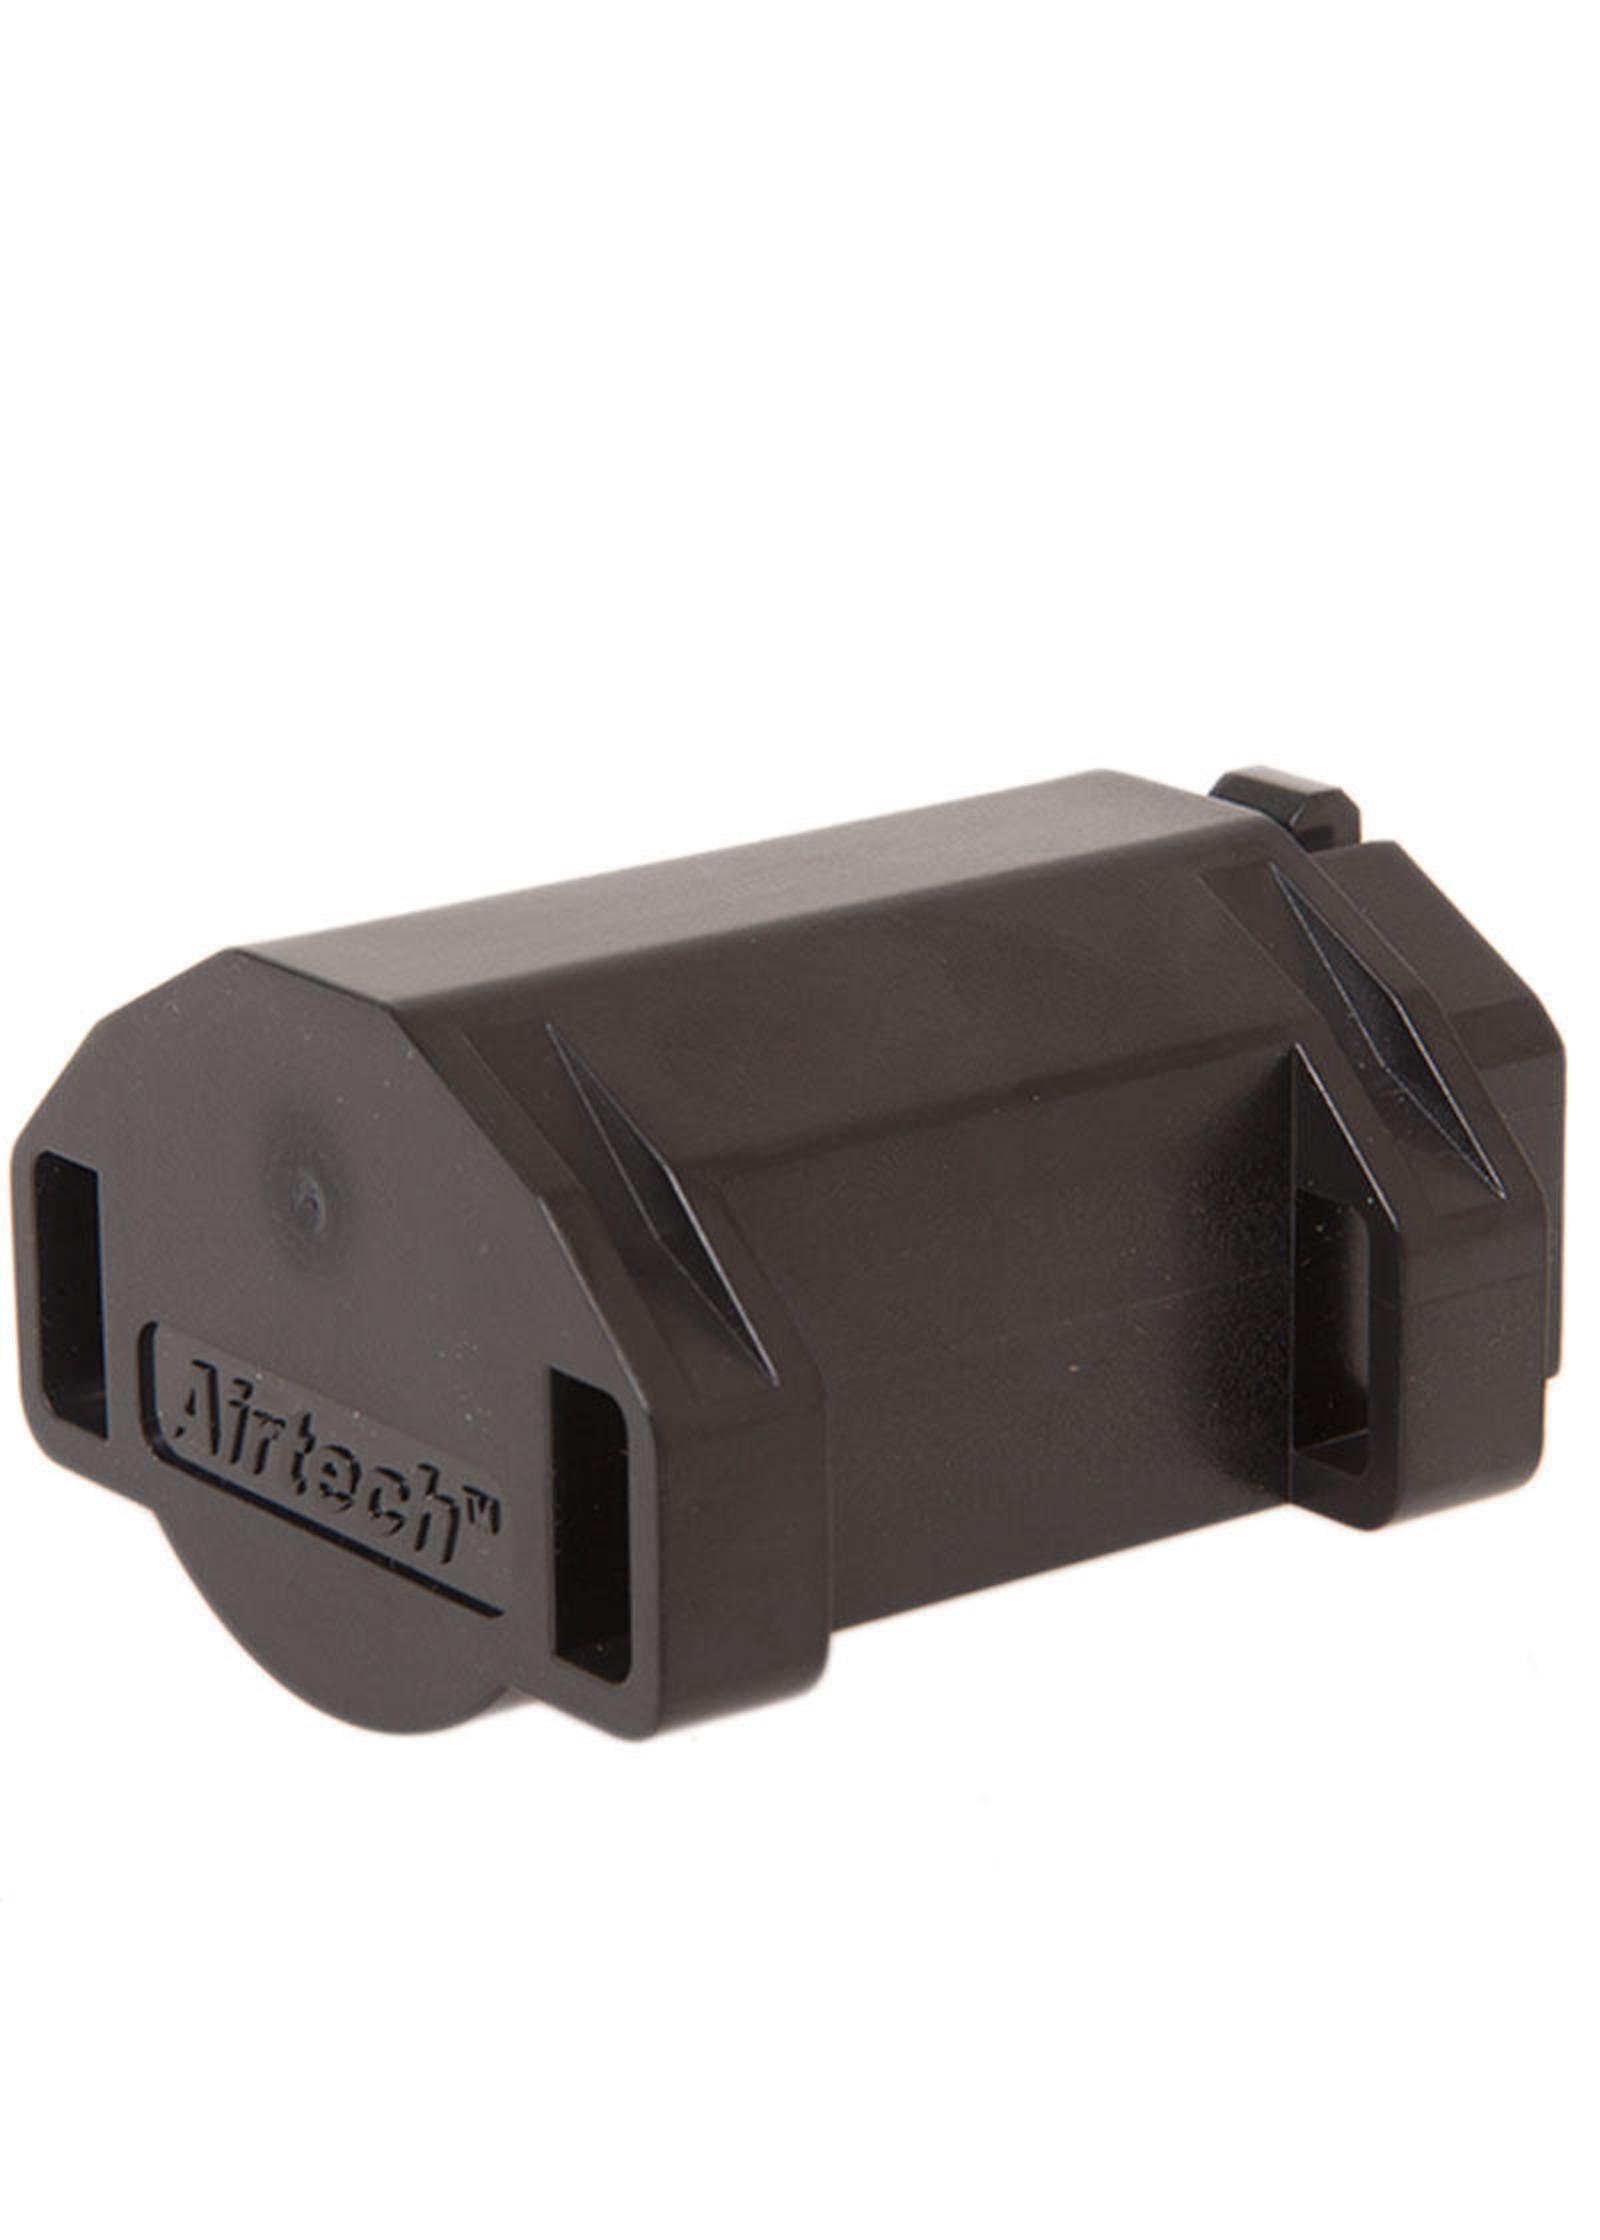 Airtech Studios BEU Battery Extension Unit for AM-013/014/015 – Black product image